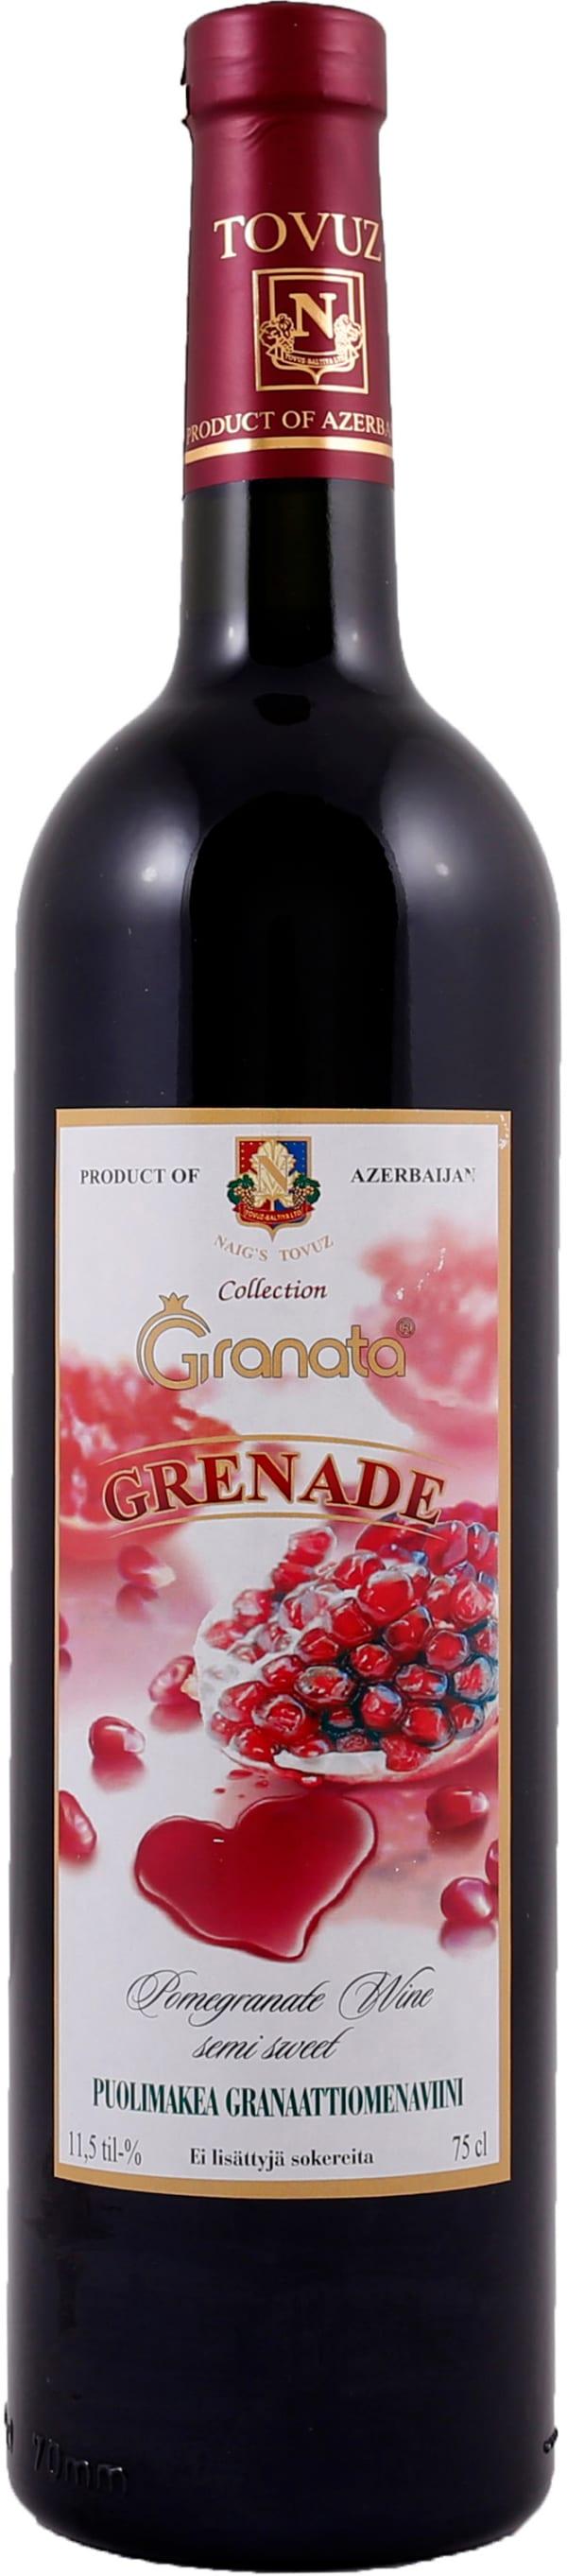 Grenade Wine Semi Sweet Puolimakea Granaattiomenaviini